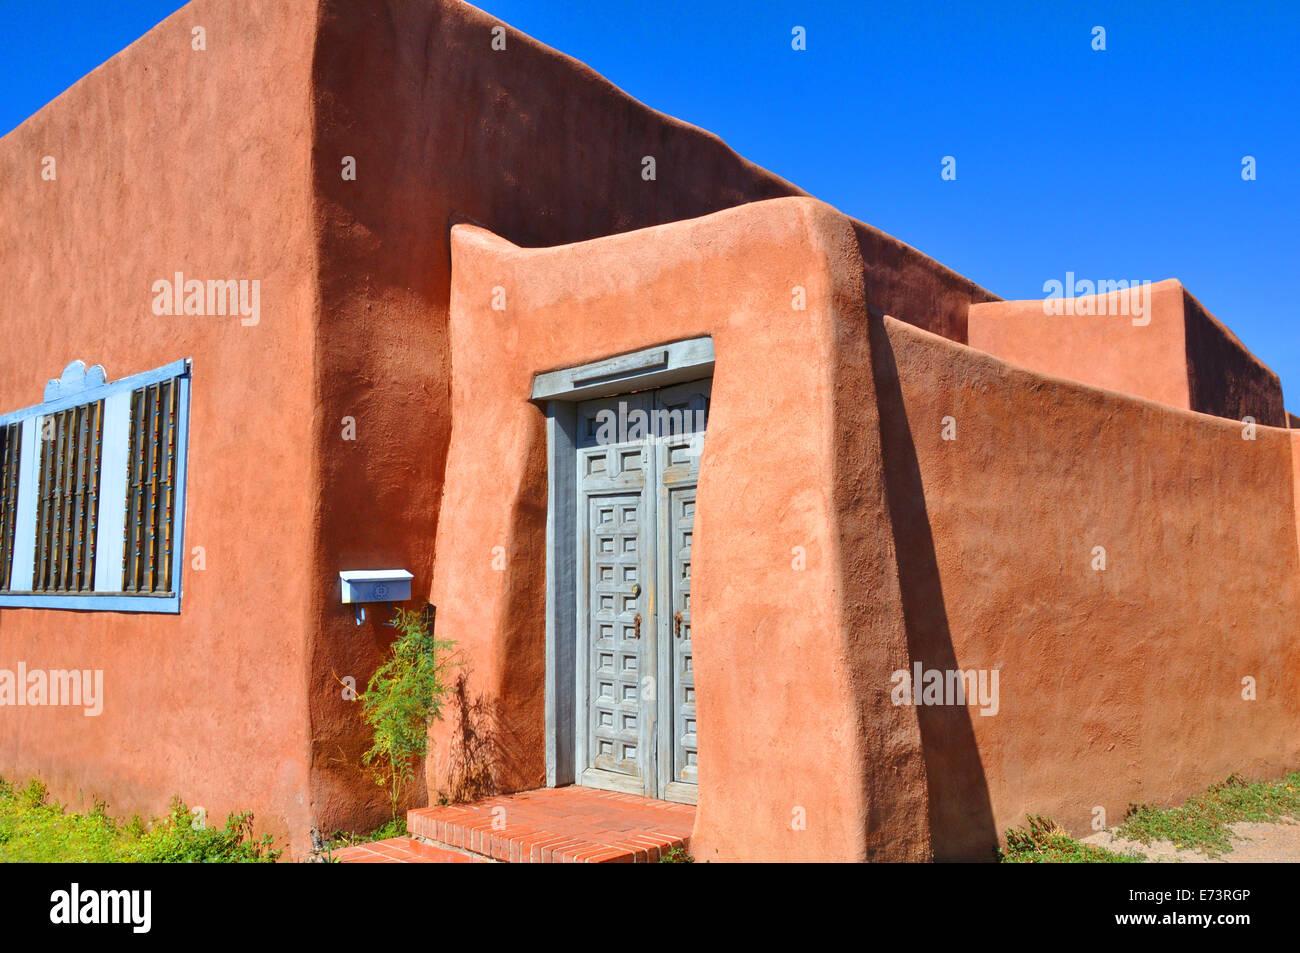 Adobe style house in Albuquerque, New Mexico, USA - Stock Image